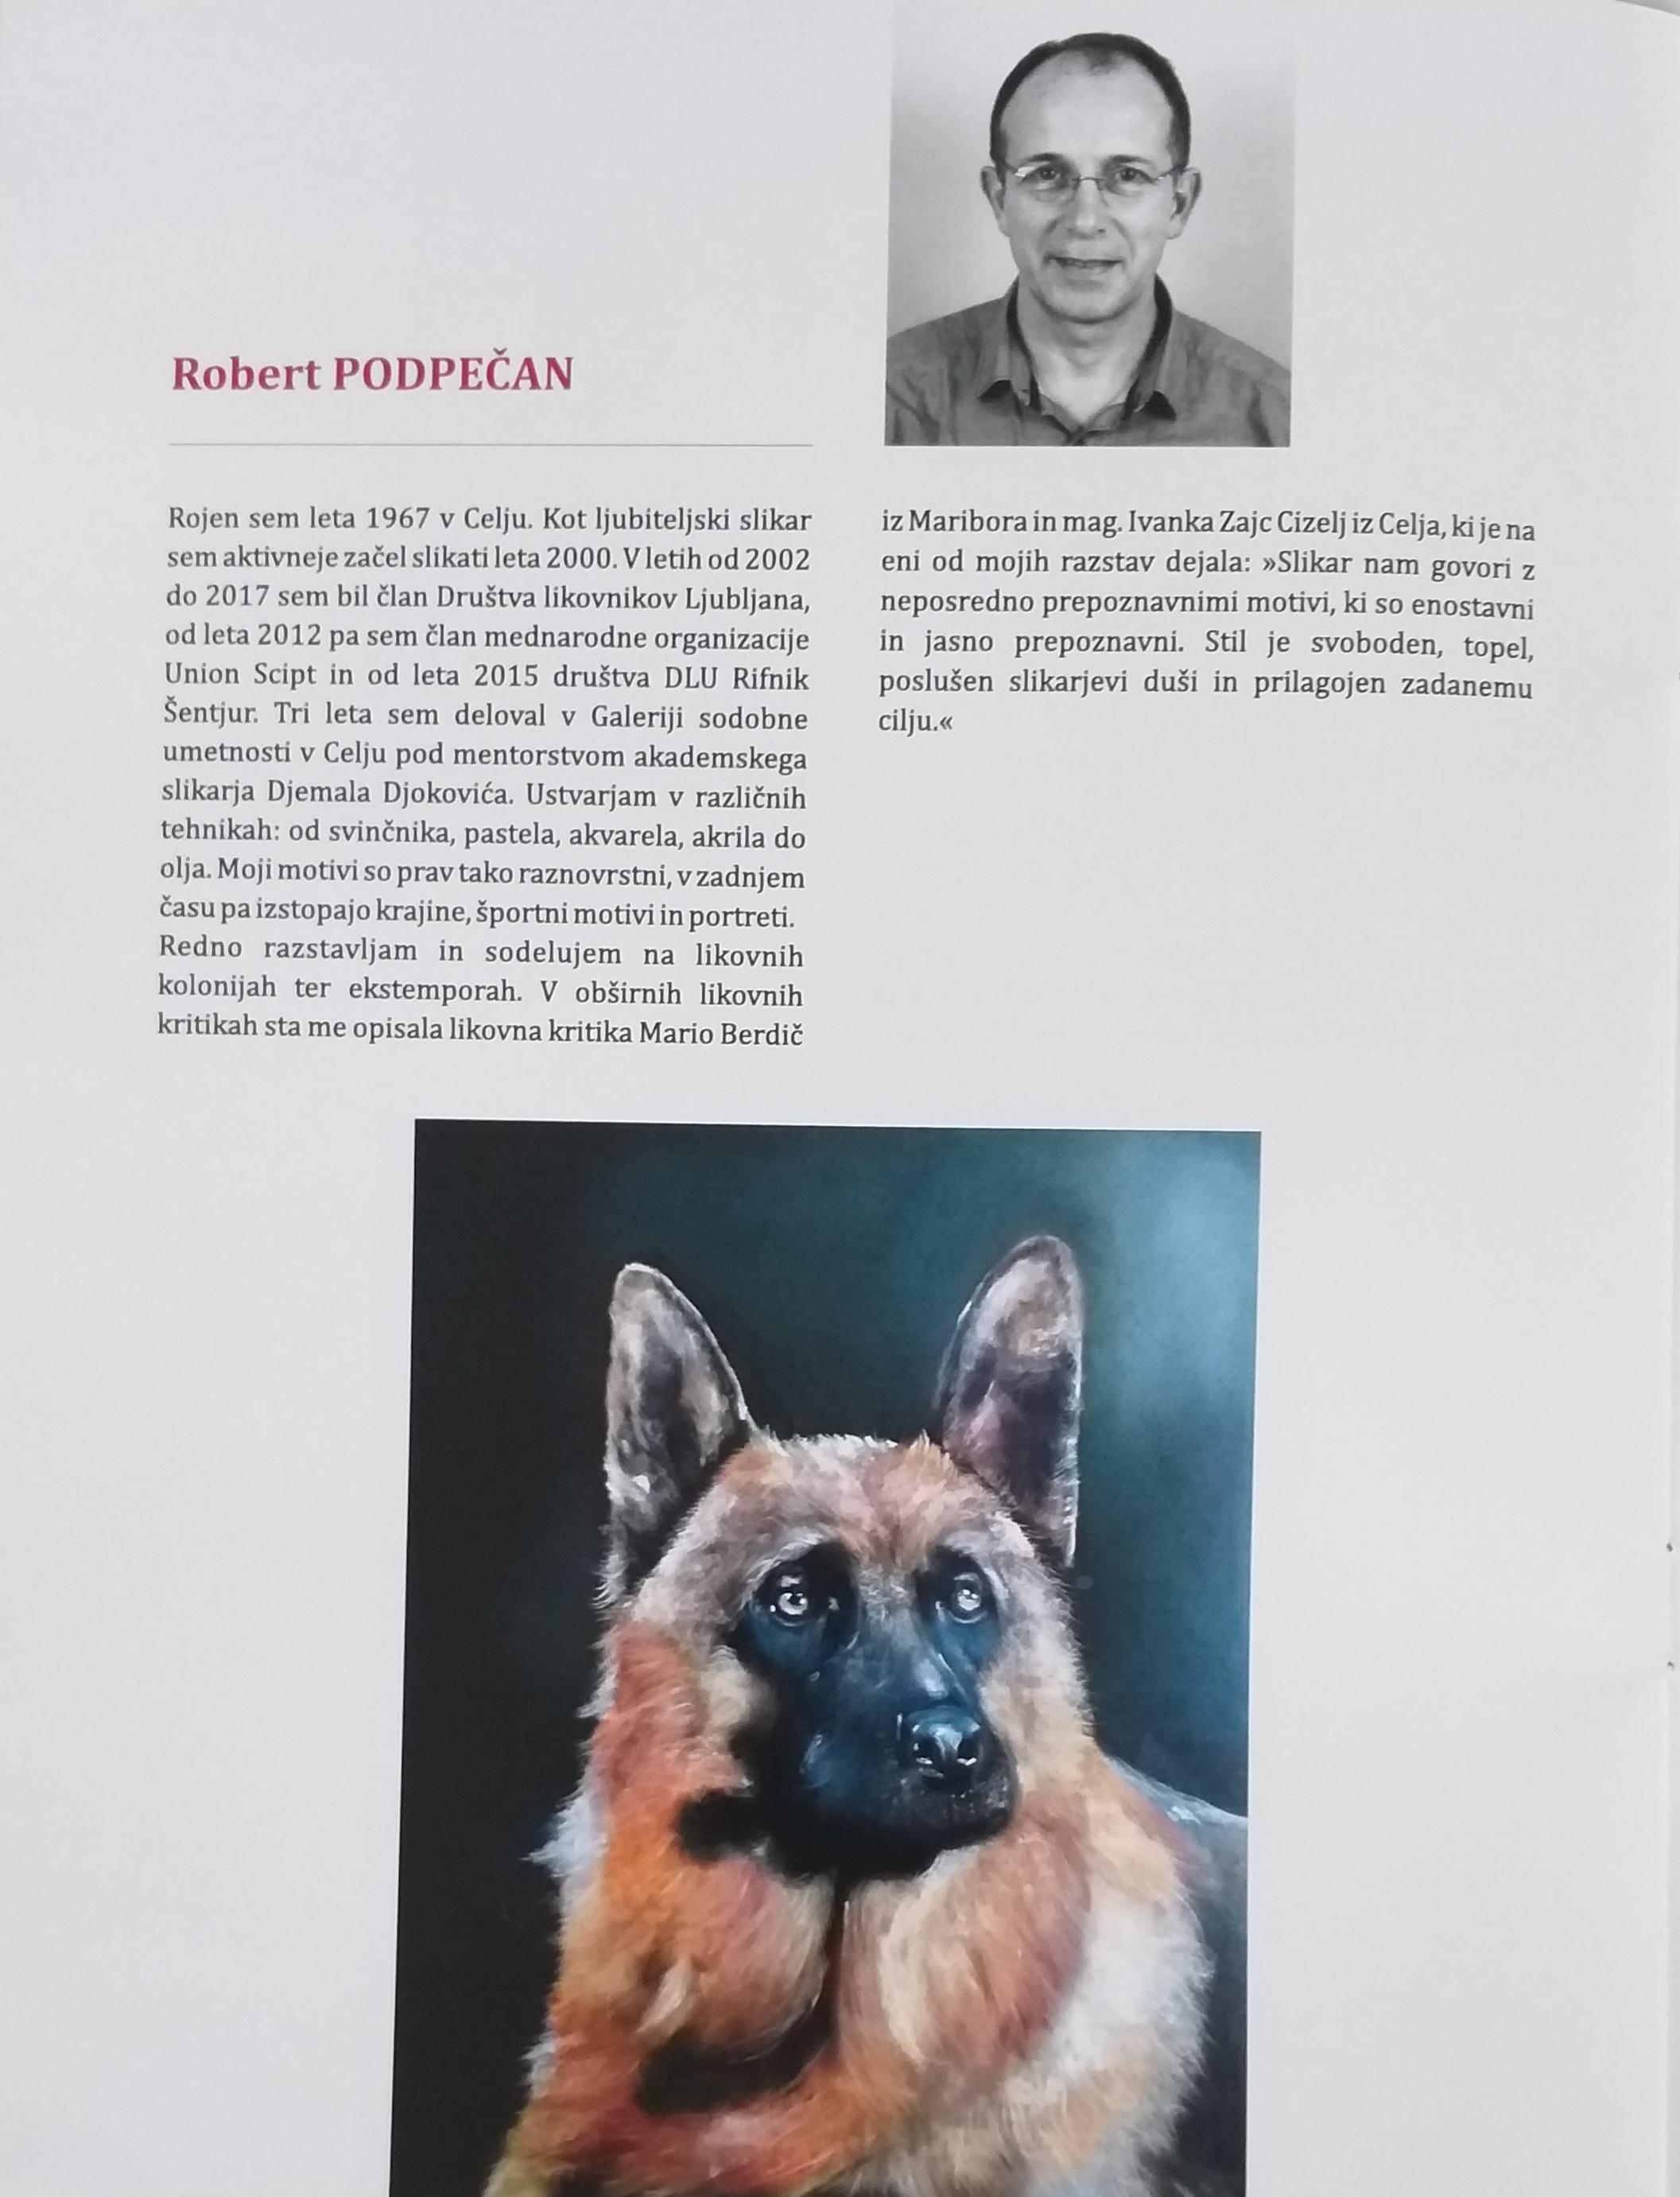 20 let DLU Rifnik 2